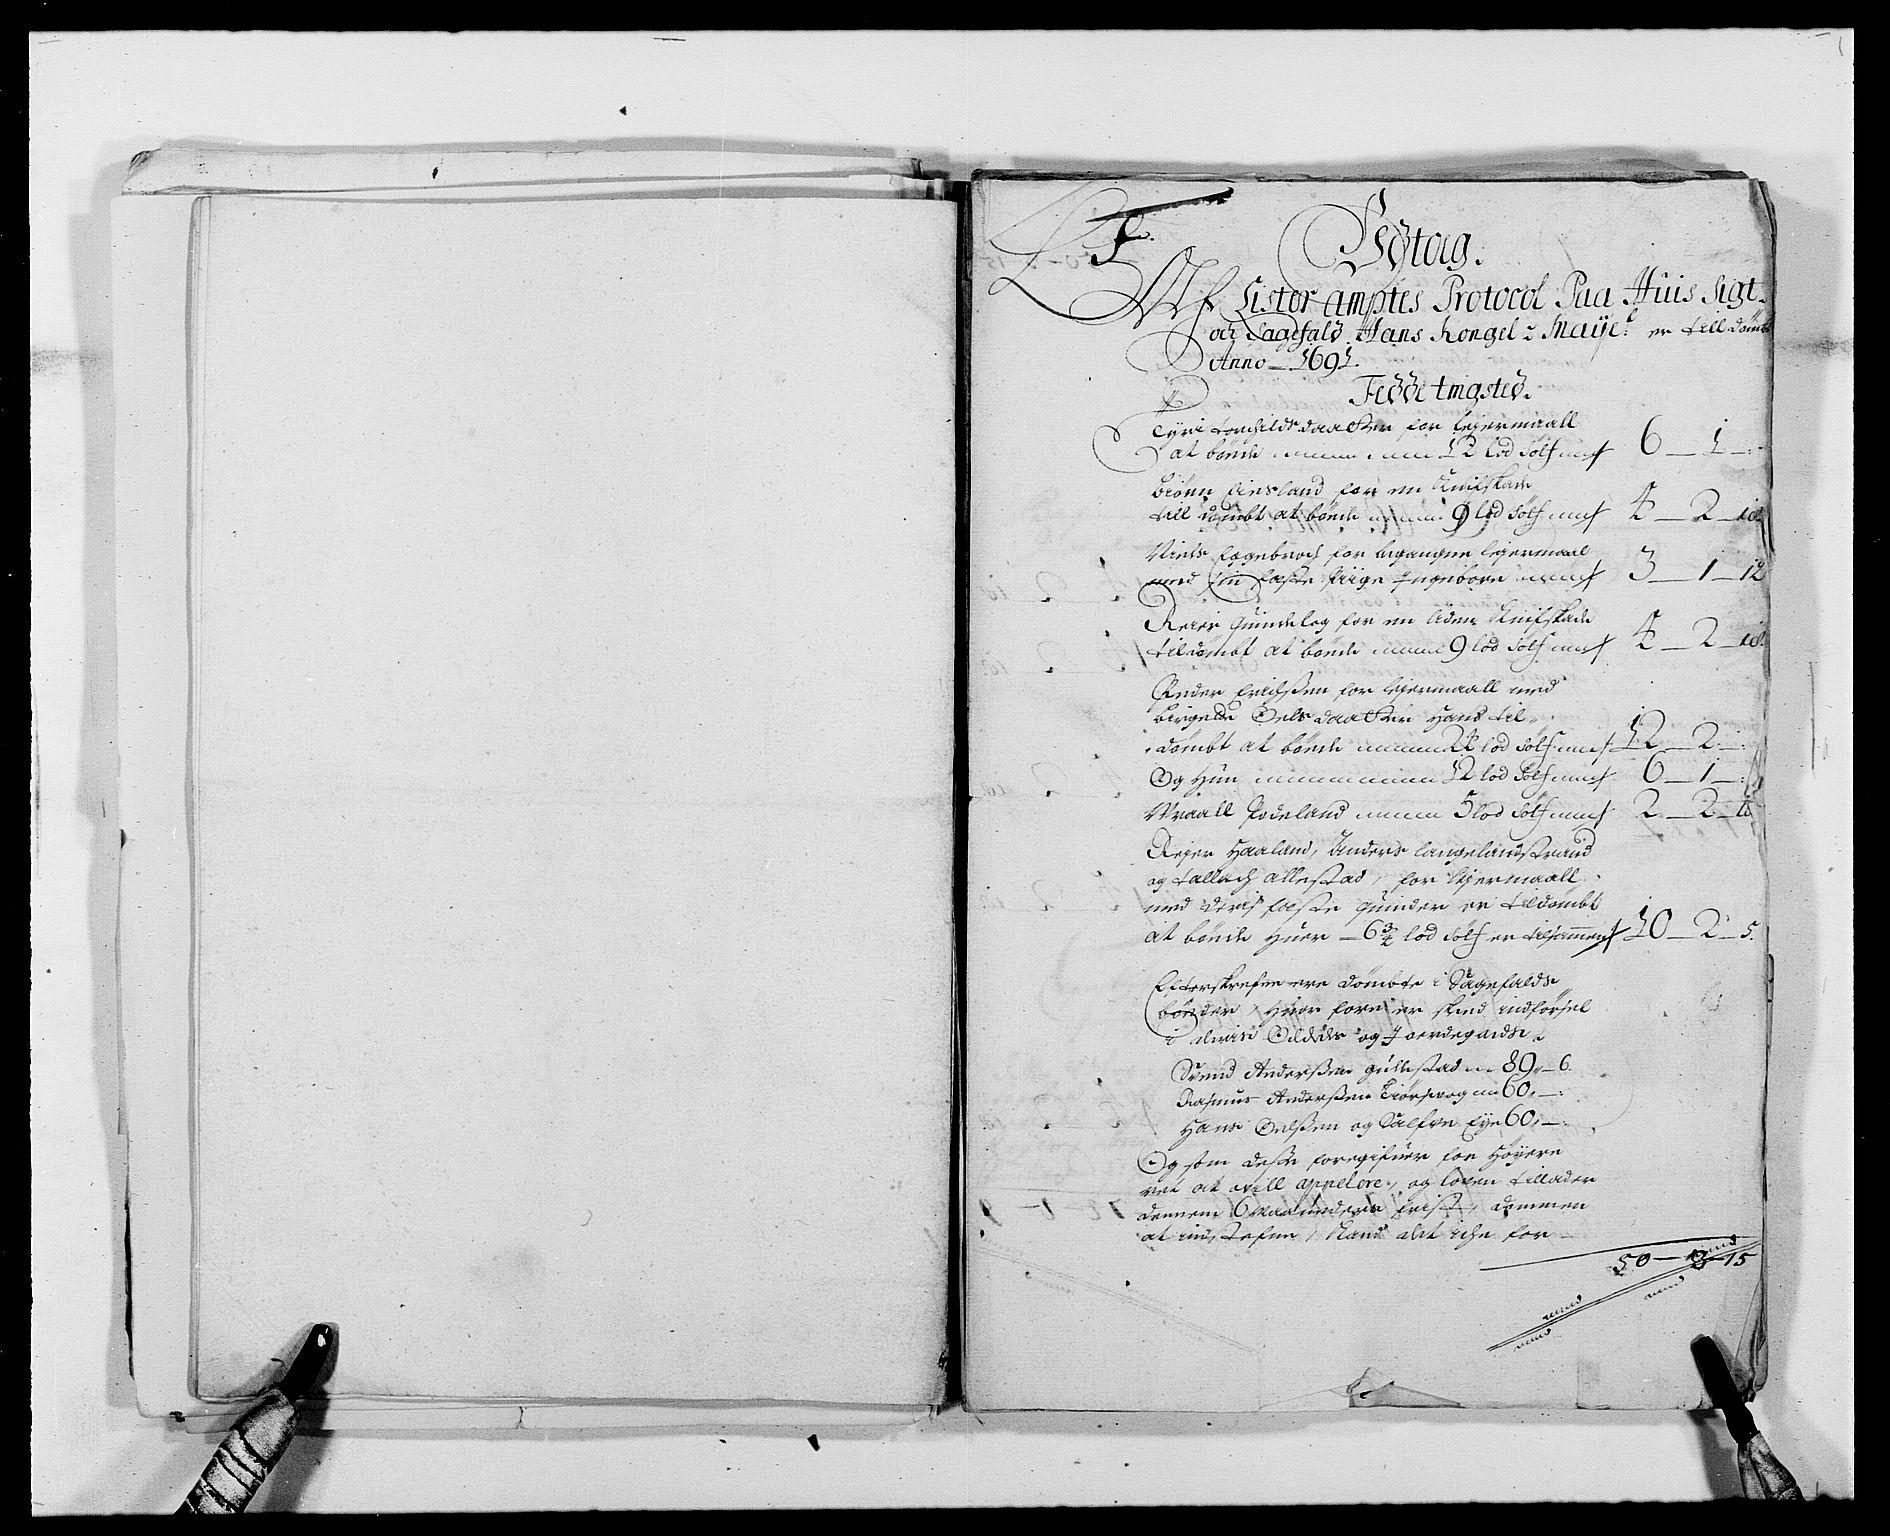 RA, Rentekammeret inntil 1814, Reviderte regnskaper, Fogderegnskap, R41/L2536: Fogderegnskap Lista, 1690-1693, s. 143